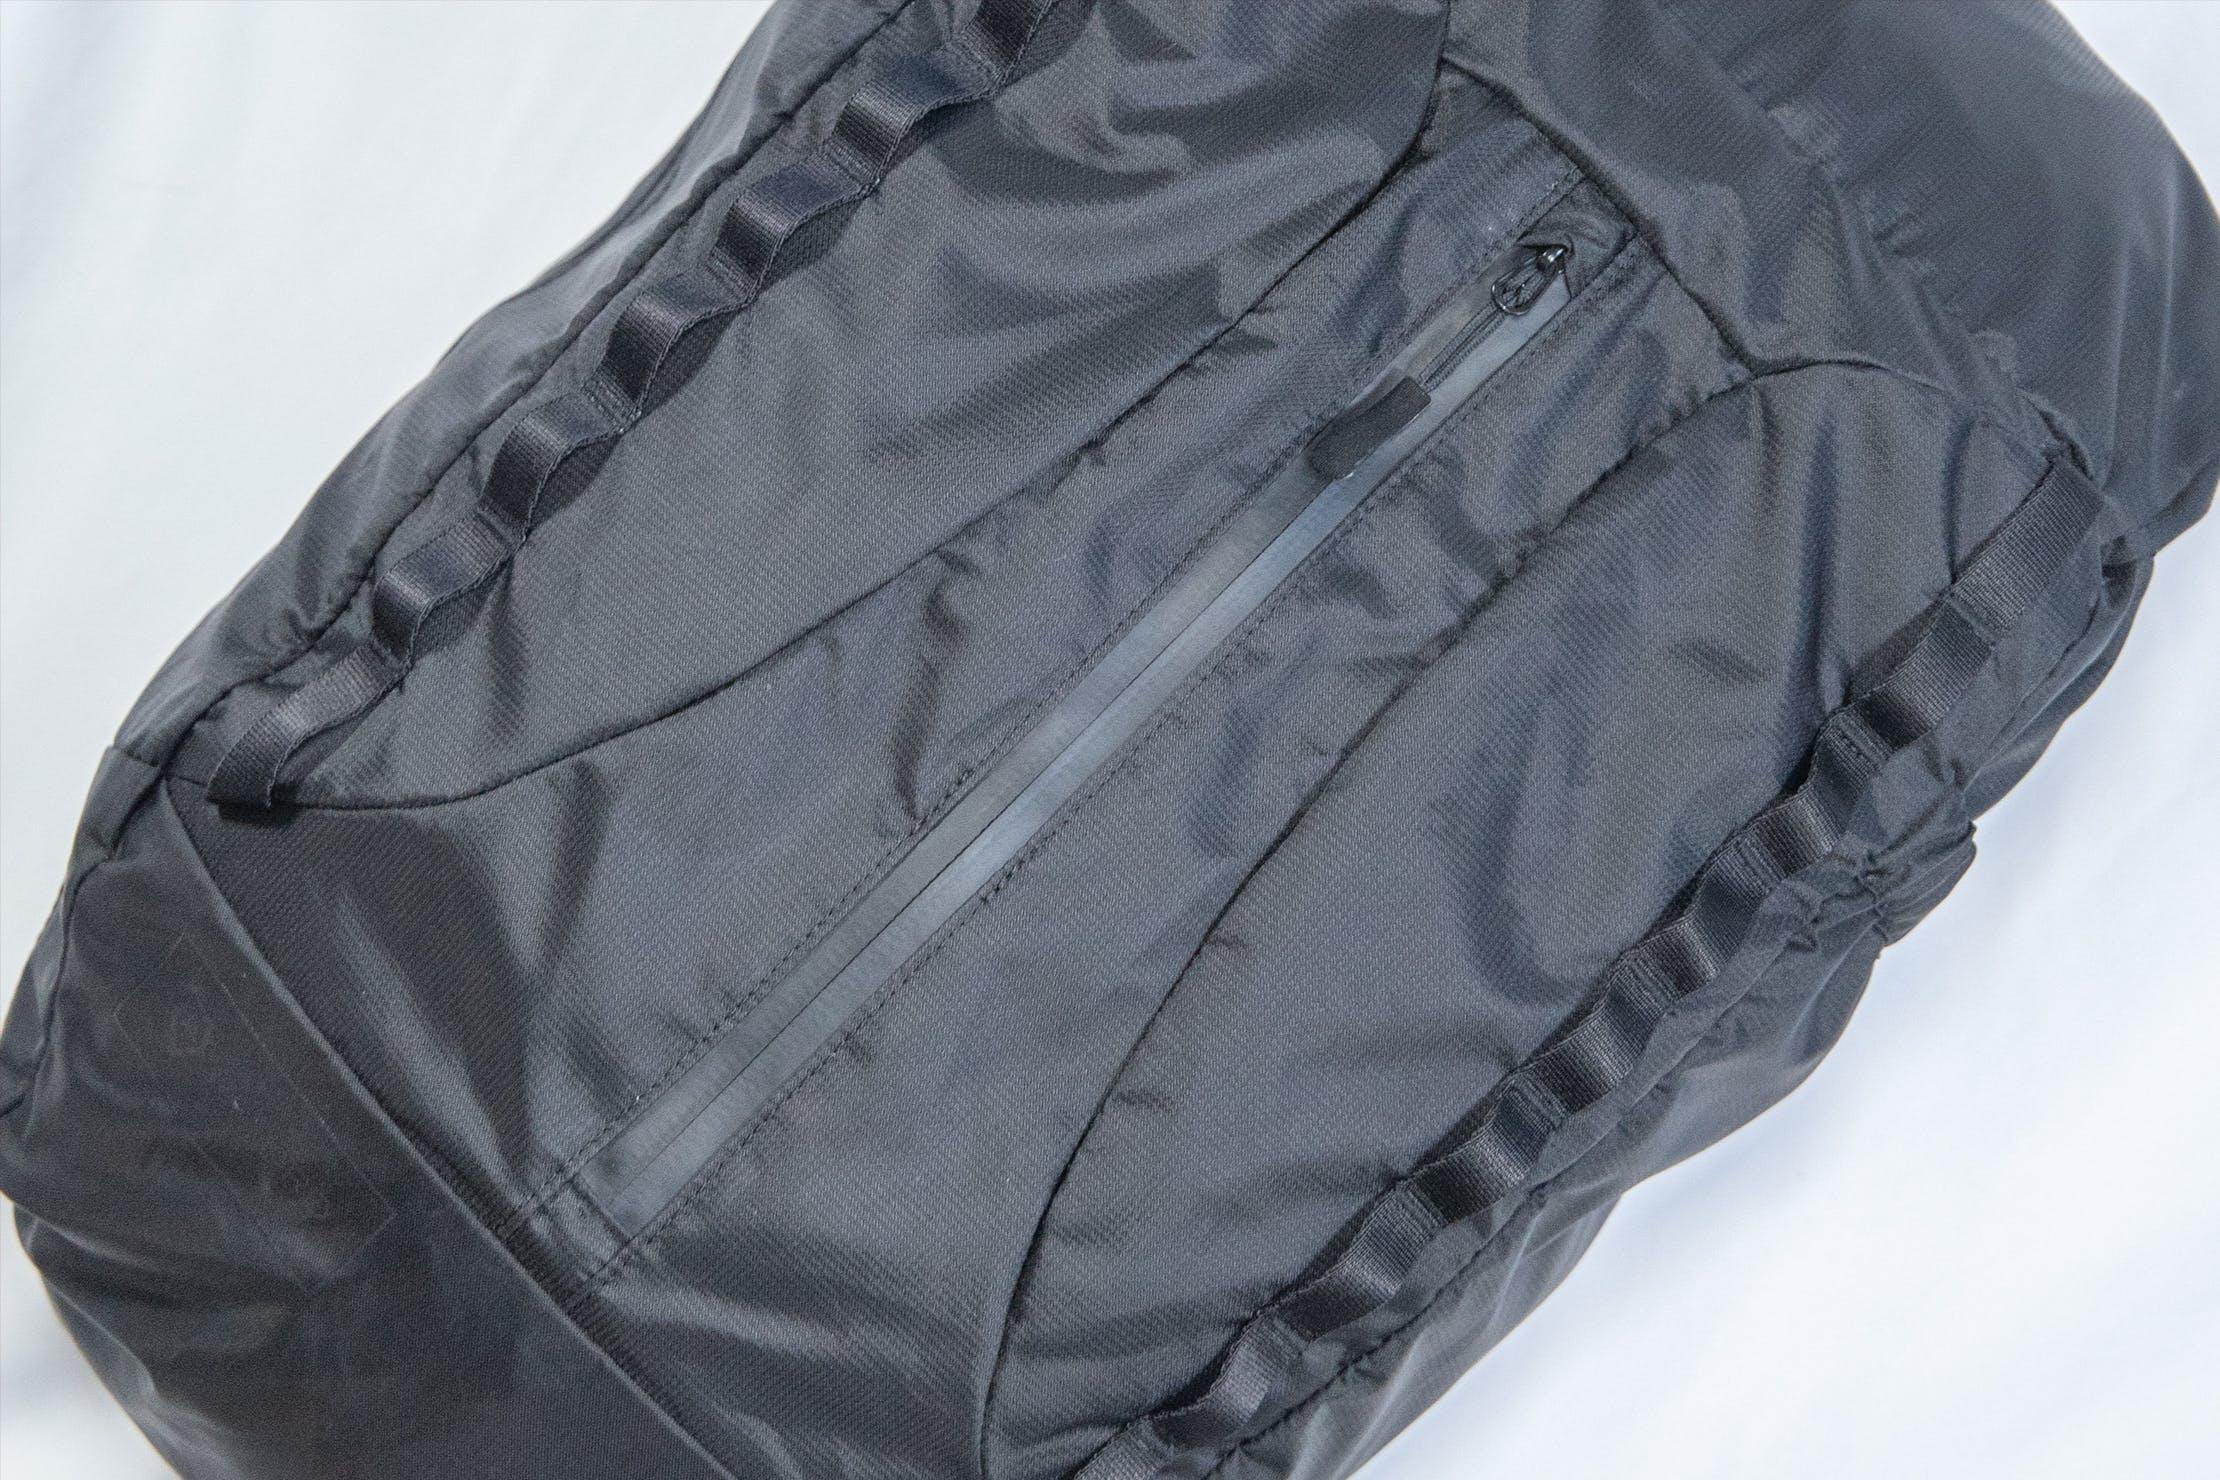 WANDRD VEER 18L Packable Pag